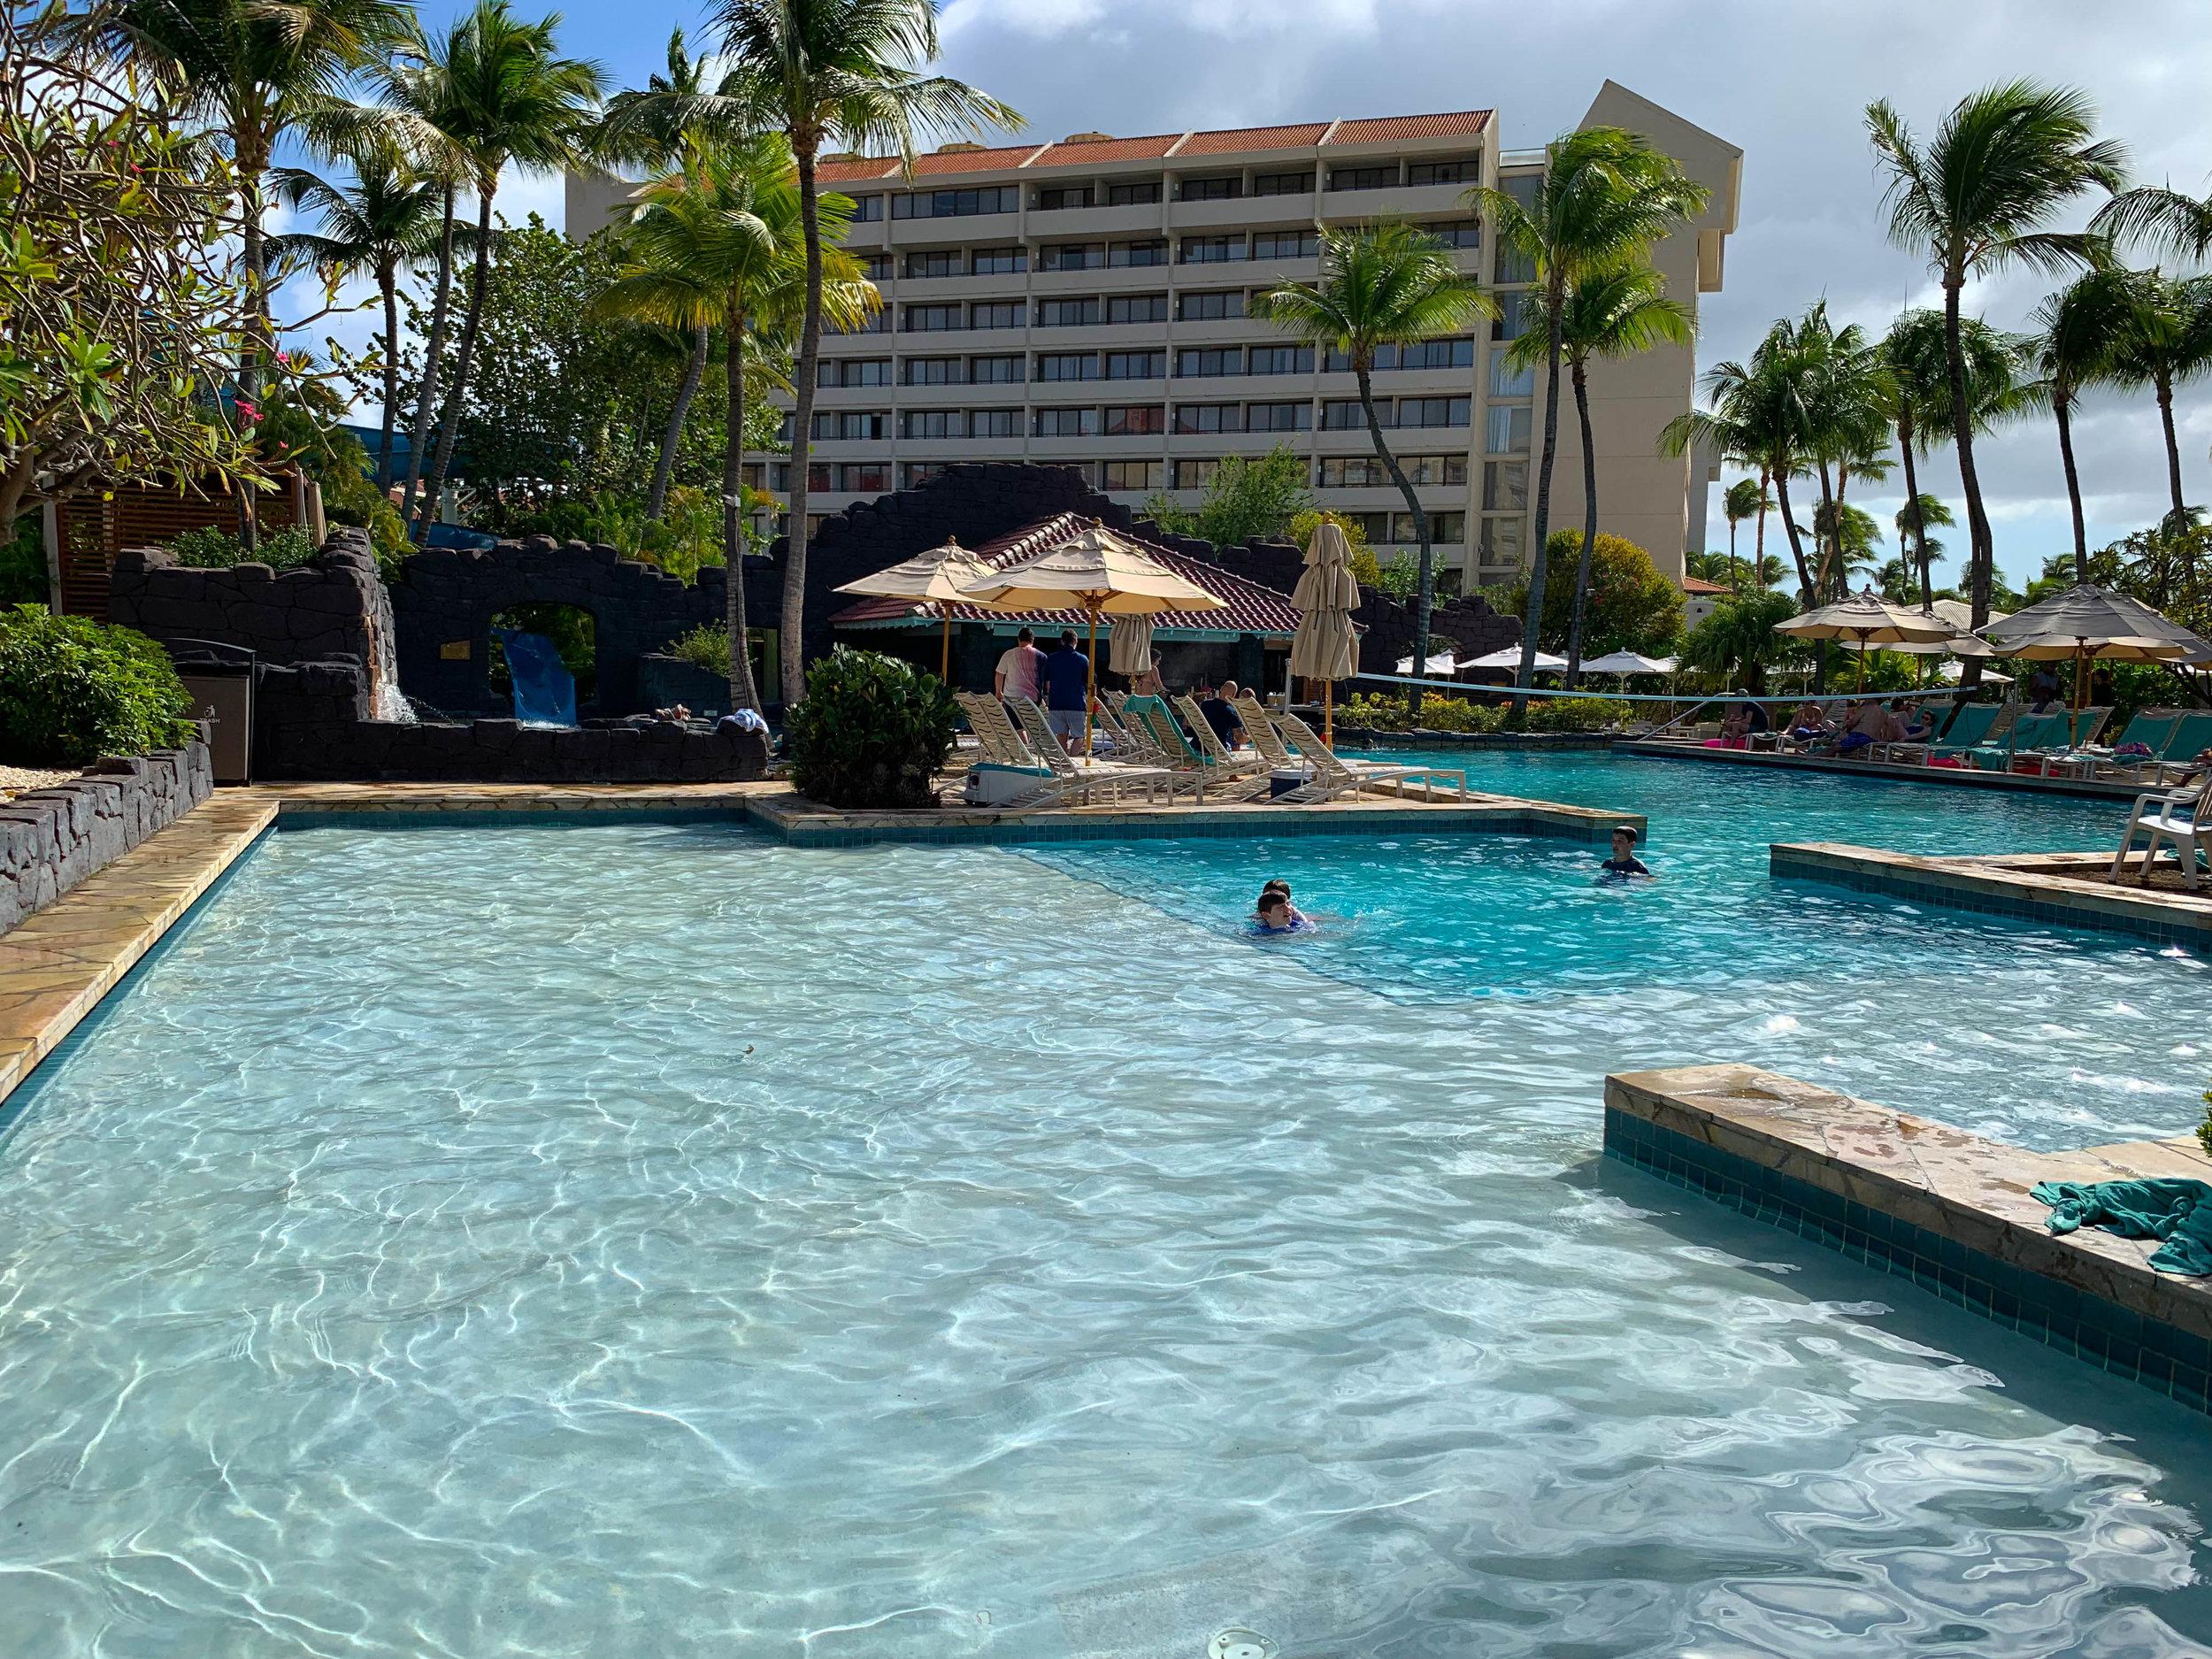 Aruba_Hyatt_Regency_pool.jpg